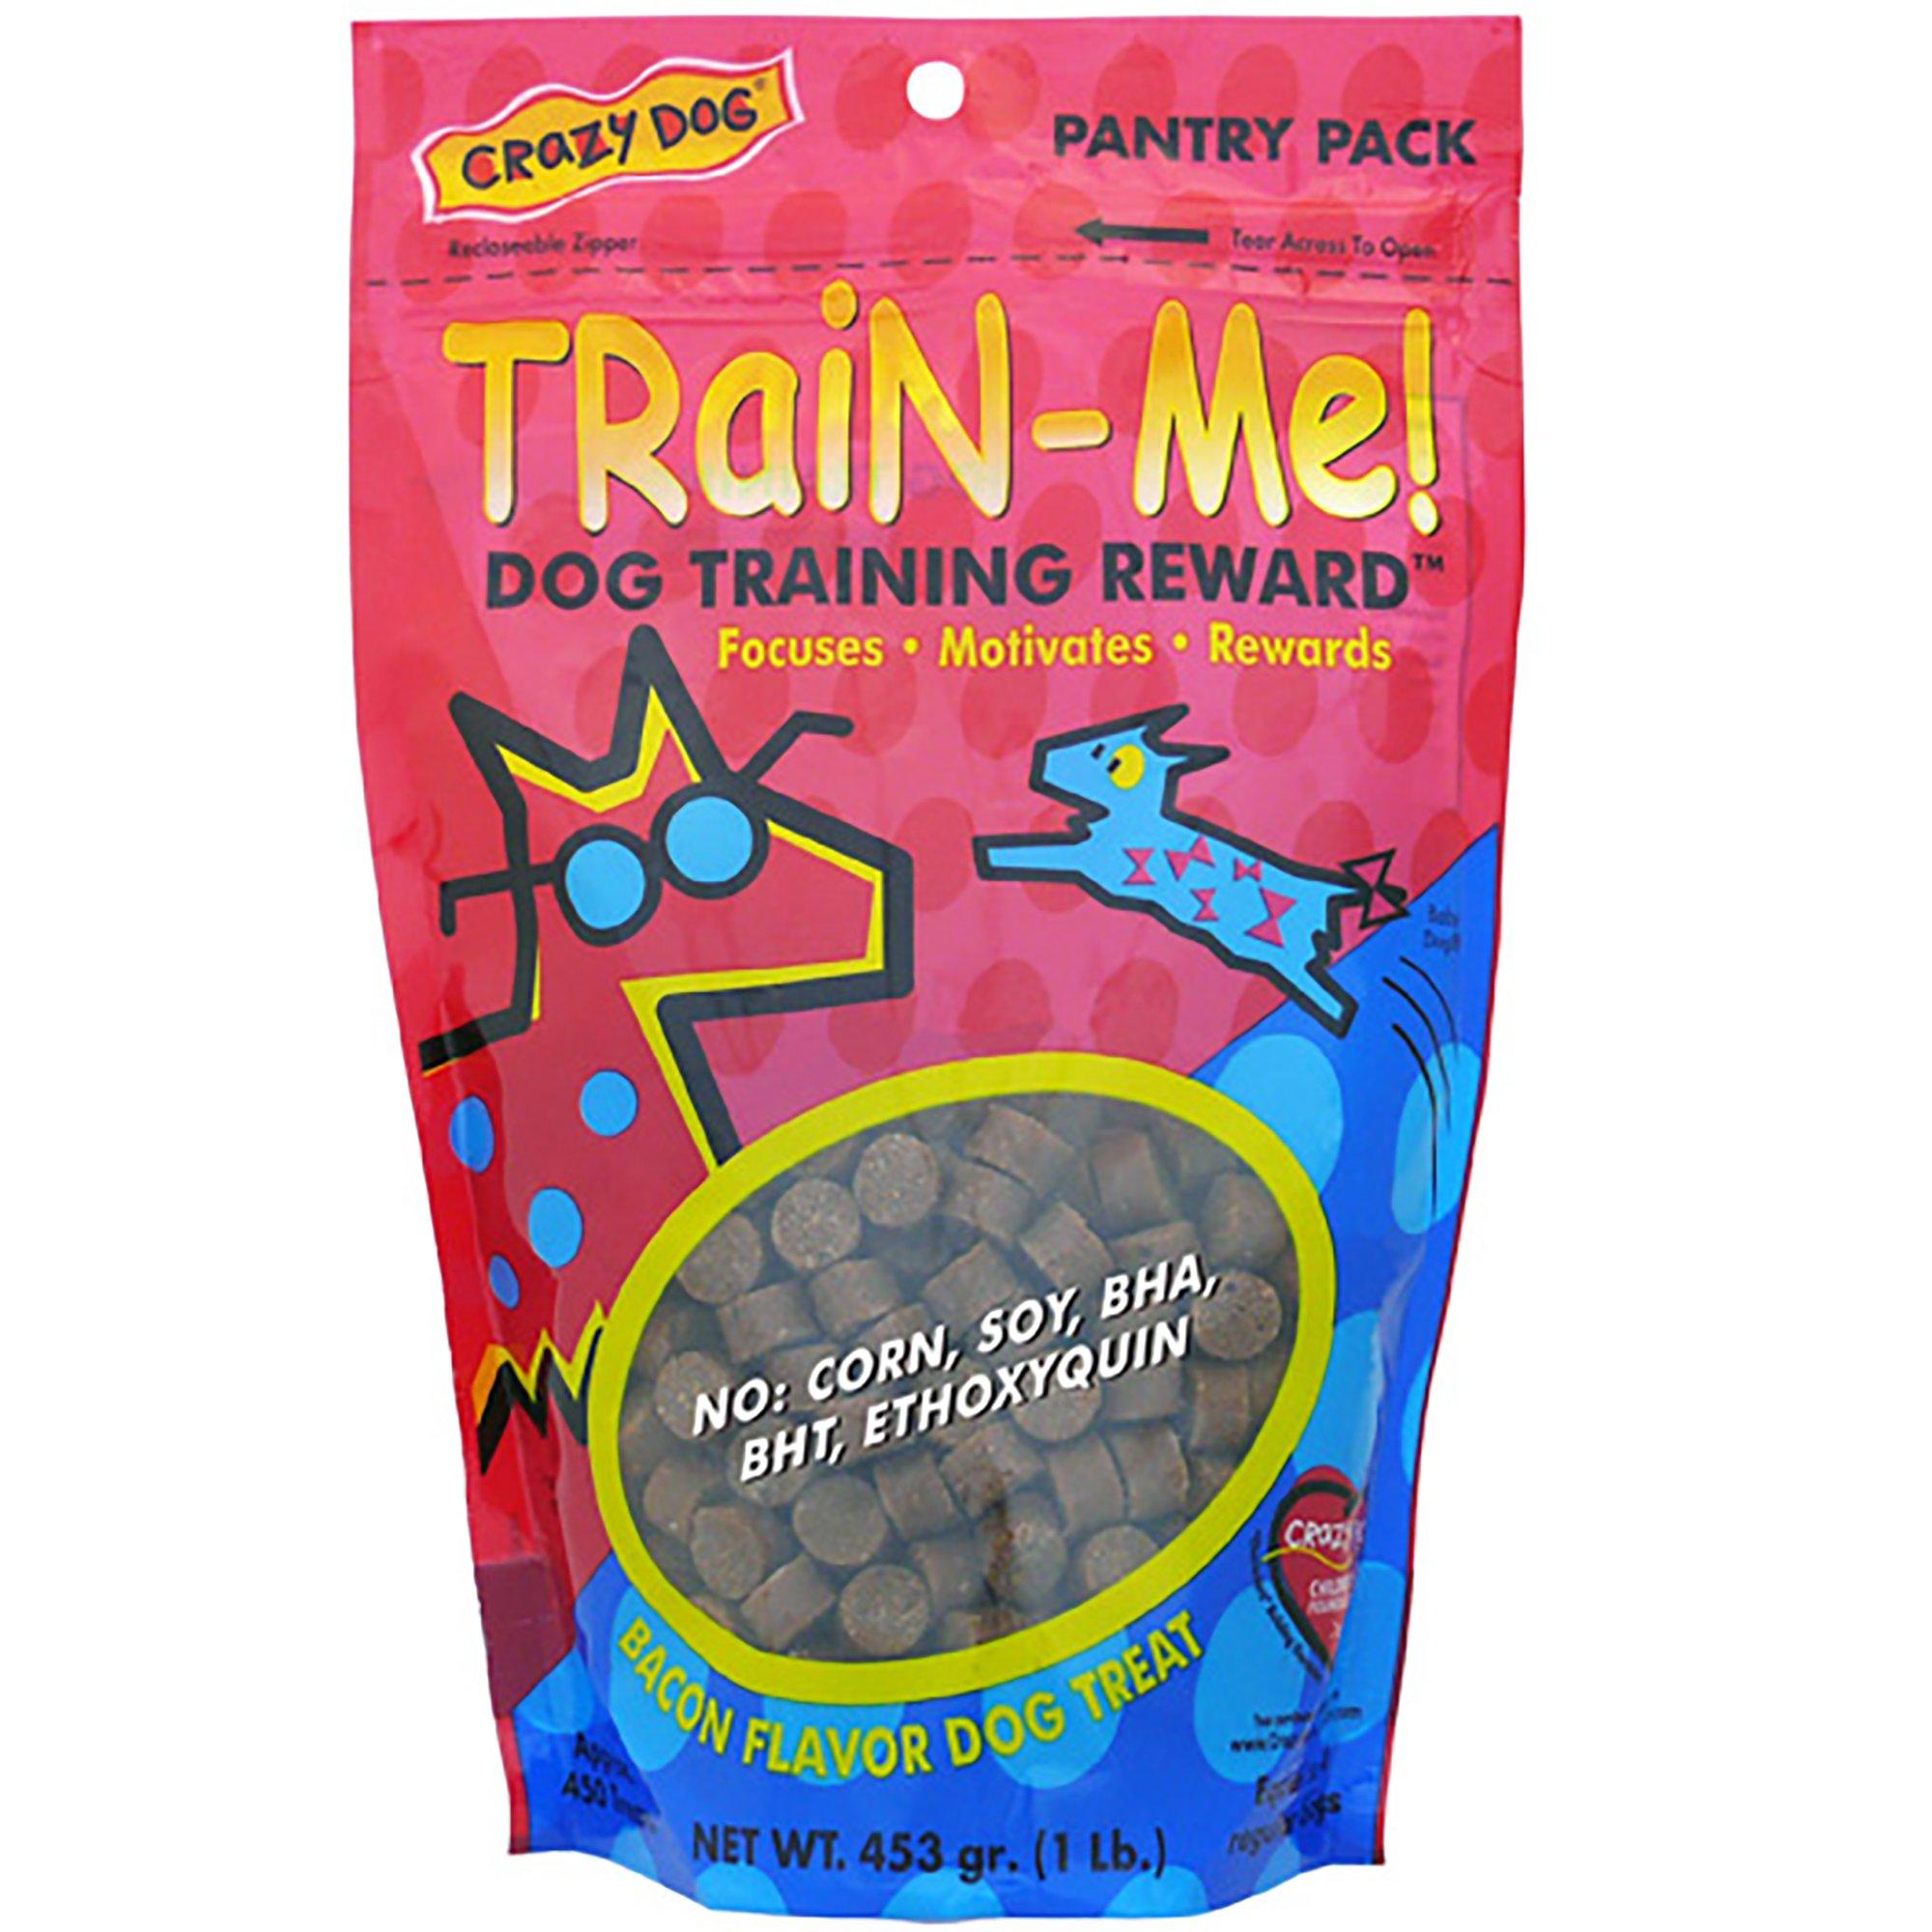 Crazy Dog Train-Me Bacon Flavored Training Reward Dog Treats